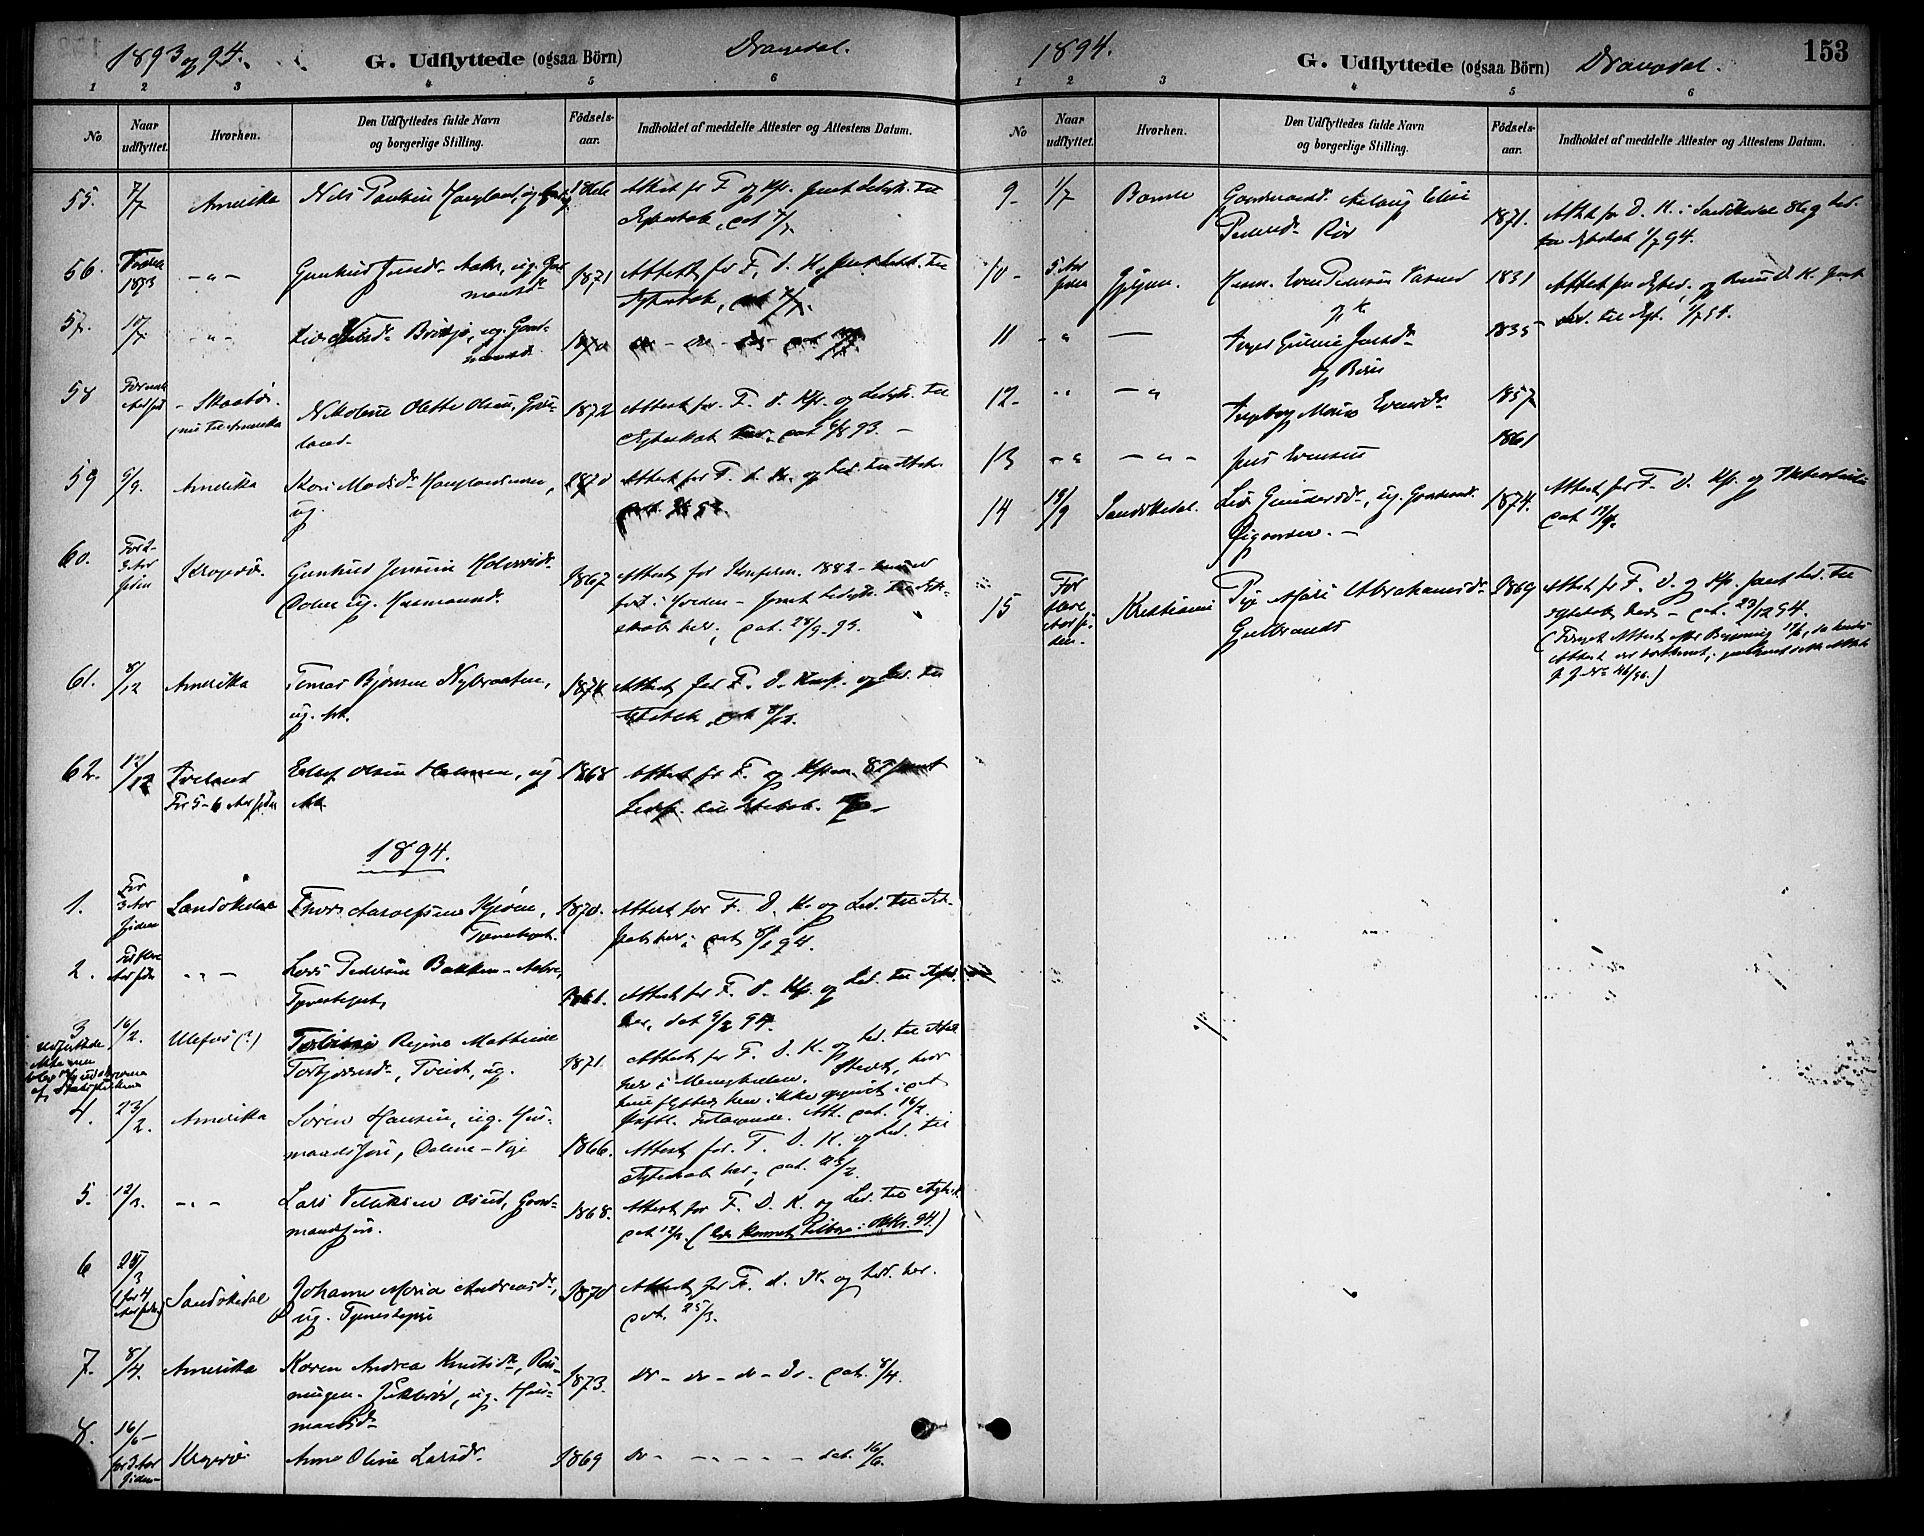 SAKO, Drangedal kirkebøker, F/Fa/L0011: Ministerialbok nr. 11 /1, 1885-1894, s. 153